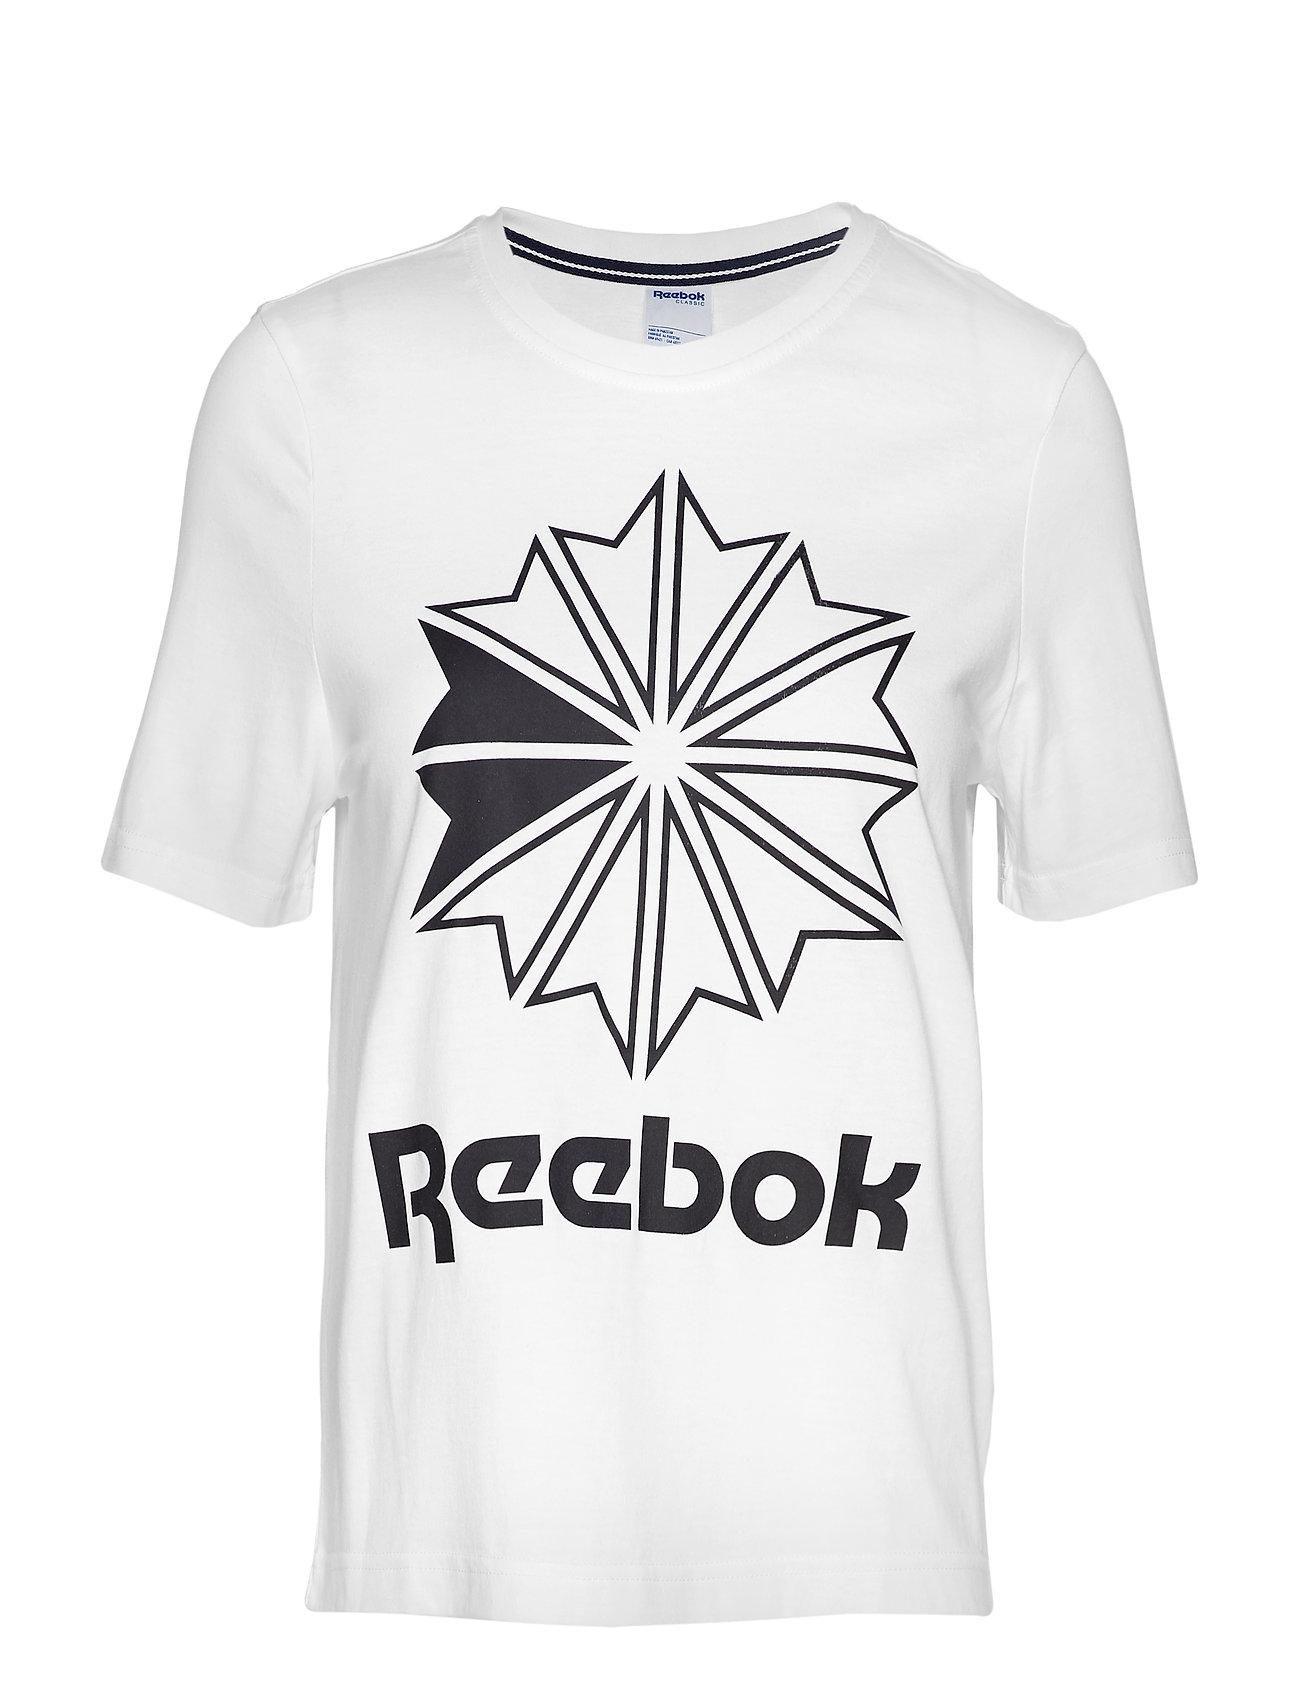 Gr blackReebok Ac Classics Ac Teewhite P0OXwk8n